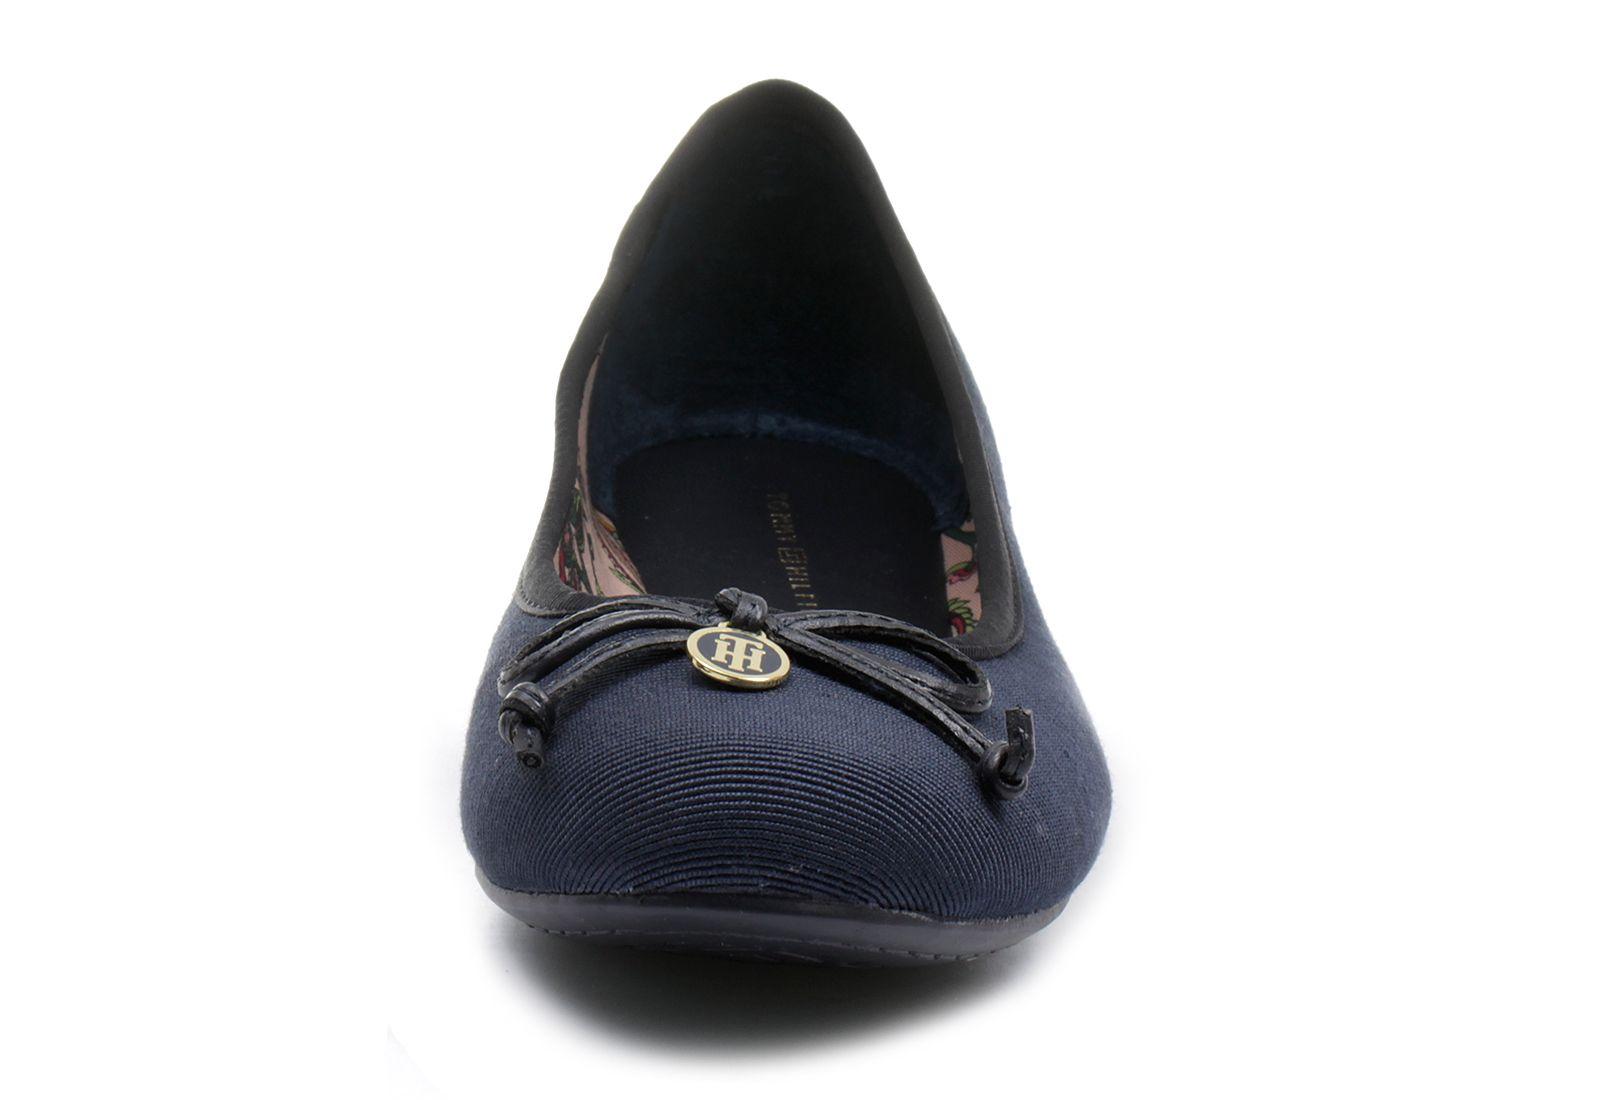 Tommy Hilfiger Balerina - Claudia 8d - 17S-1017-403 - Office Shoes ... 7d8c308d17